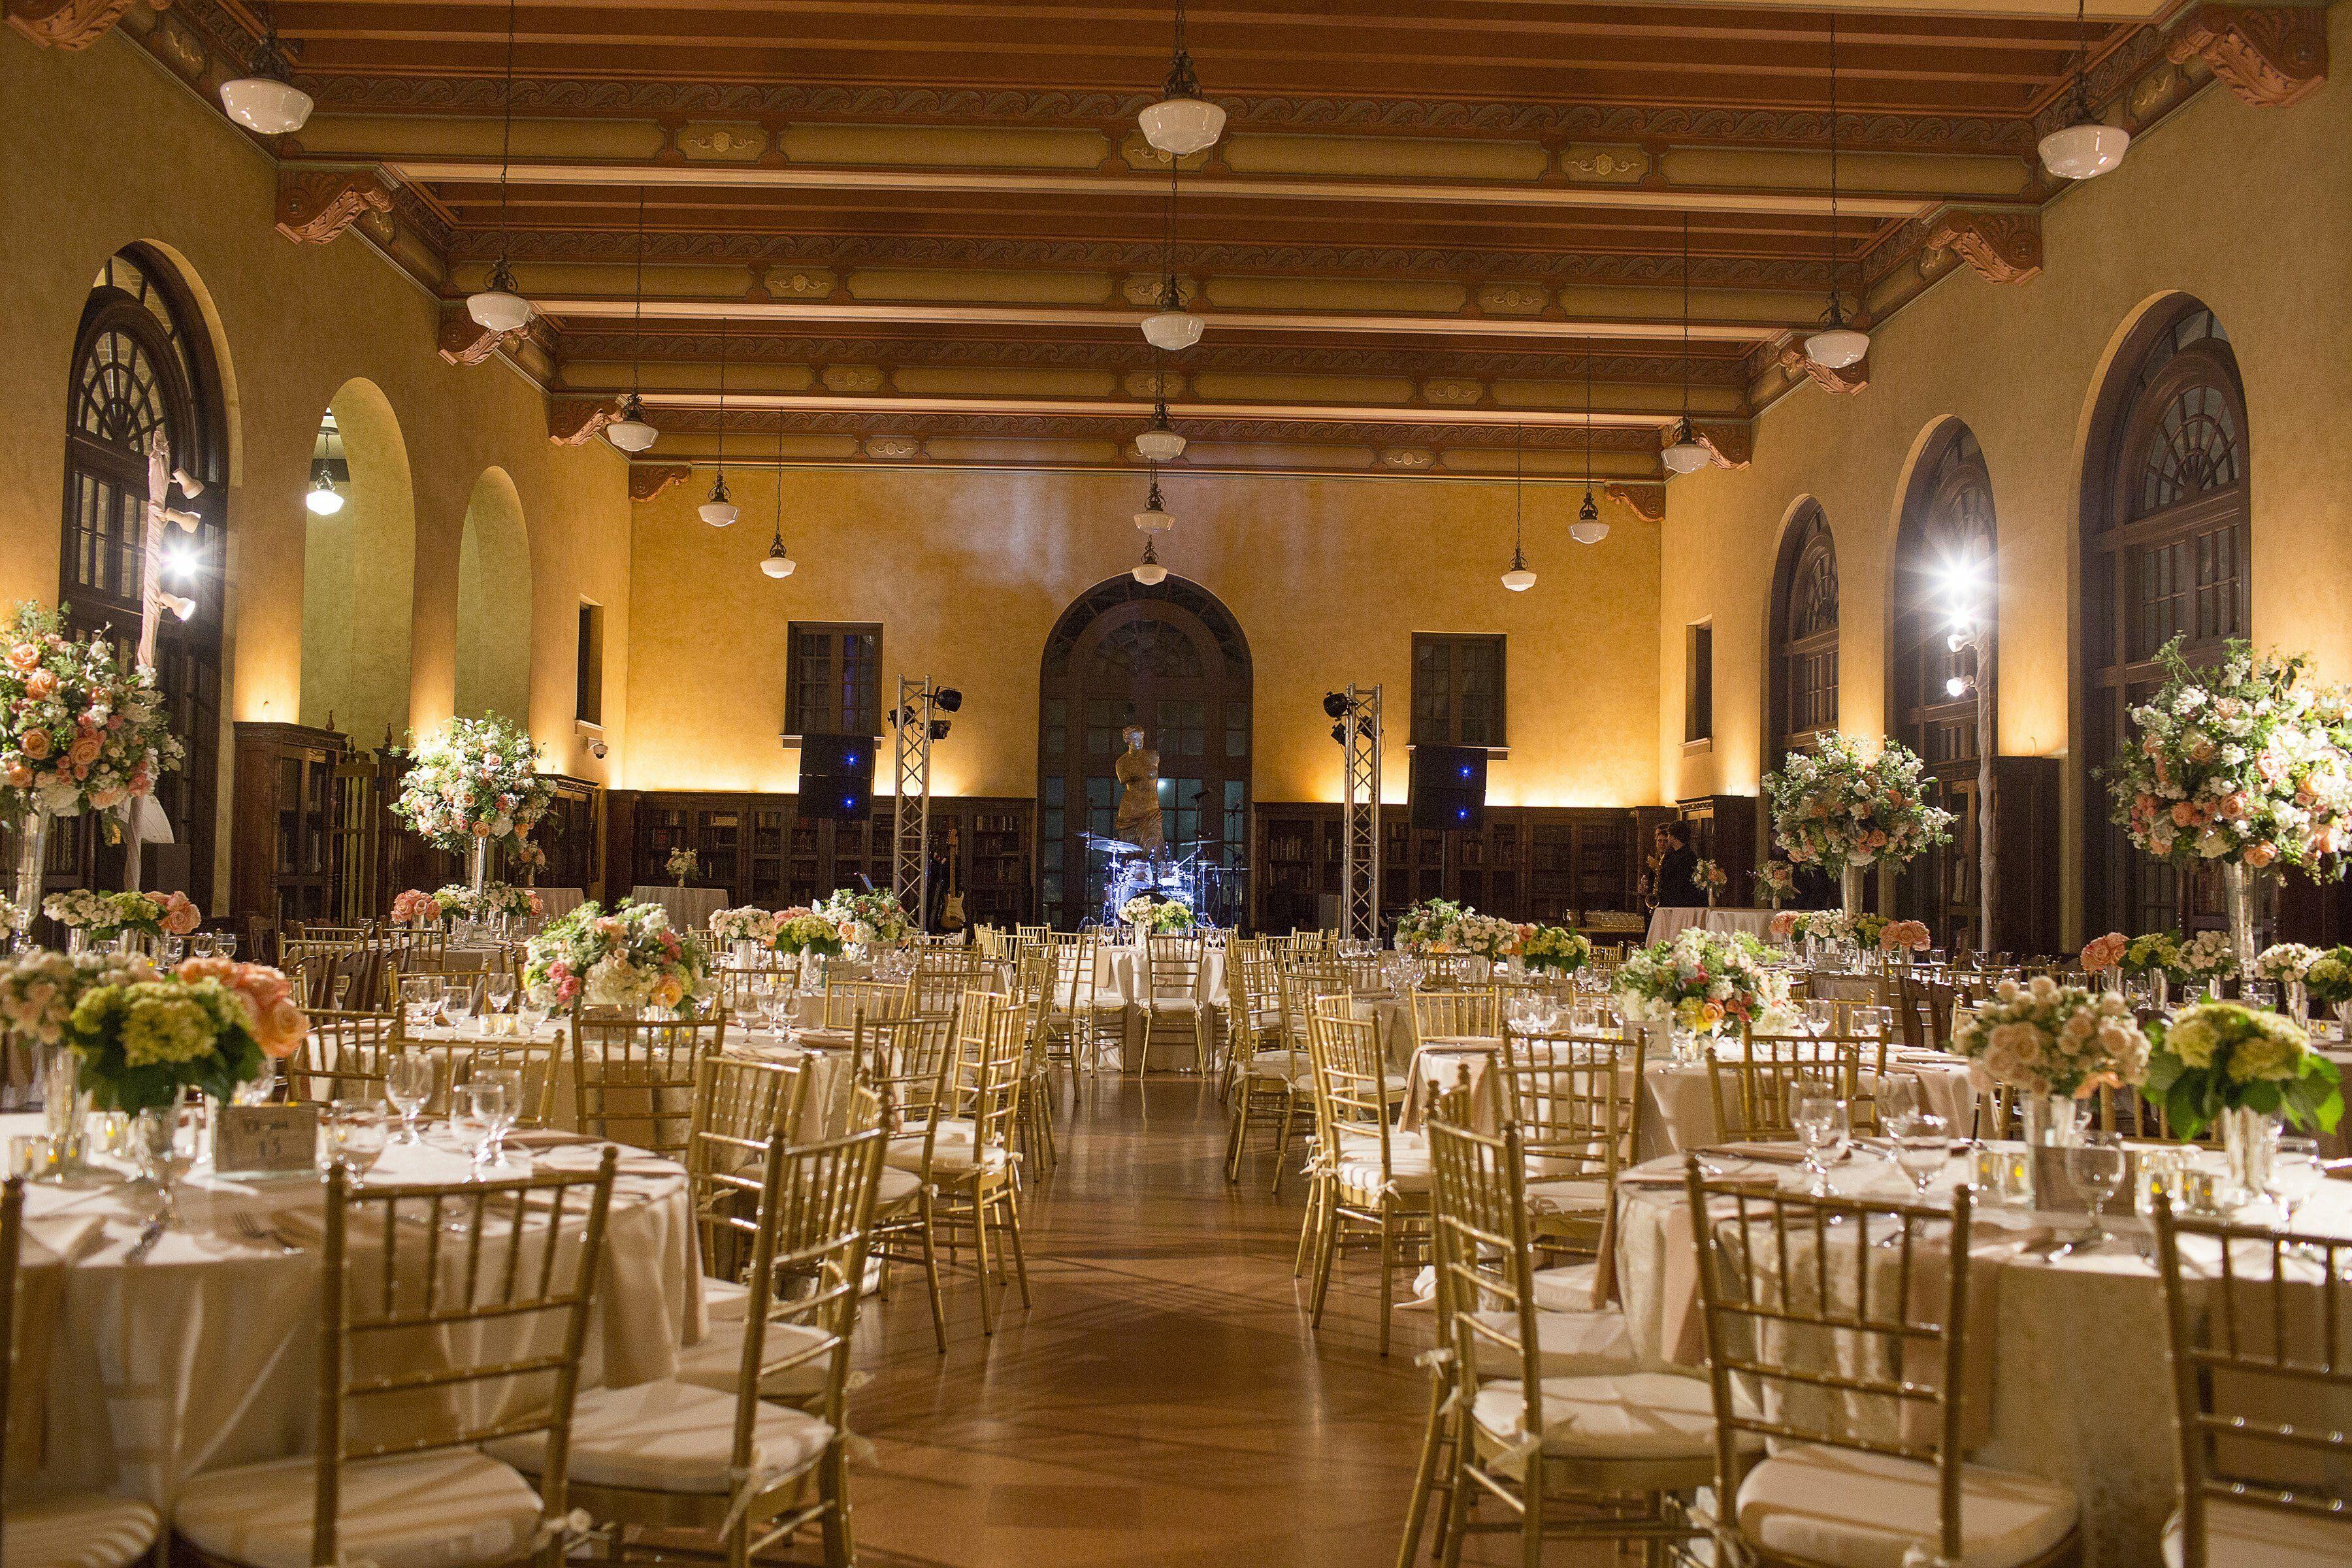 a julia ideson library wedding in houston texas 273a1cfc efc2 1b04 6ede 66eac0e16922~rs 729